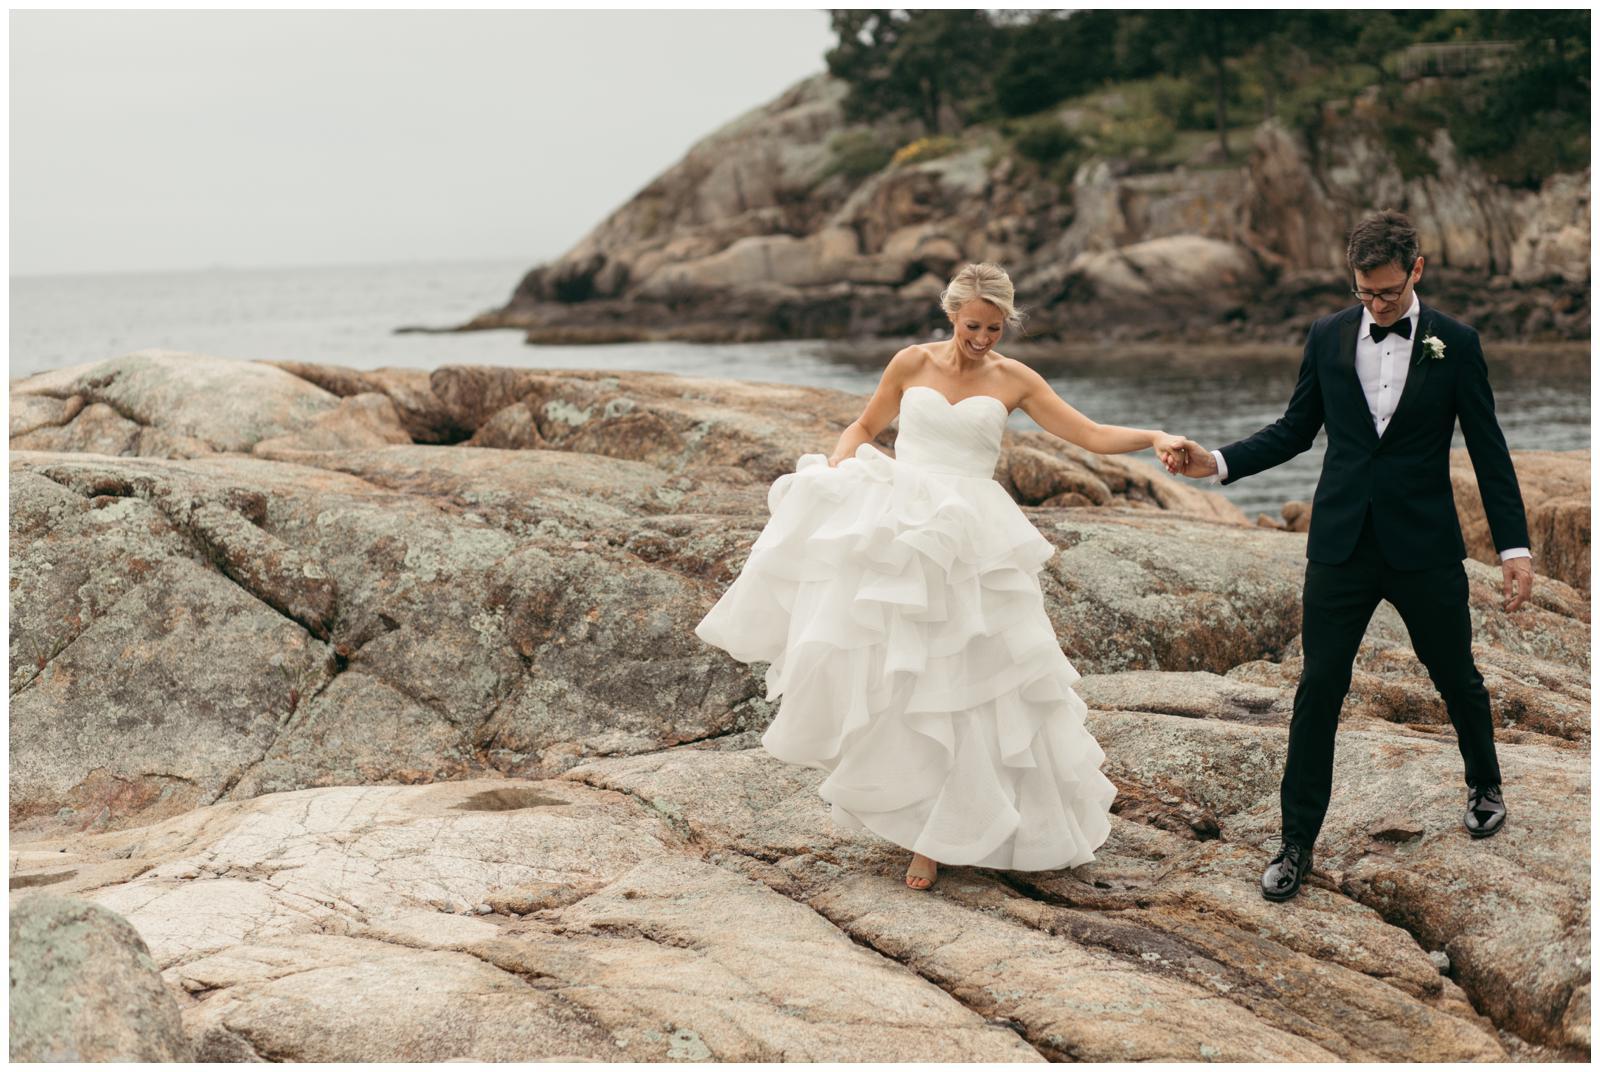 North shore wedding photos